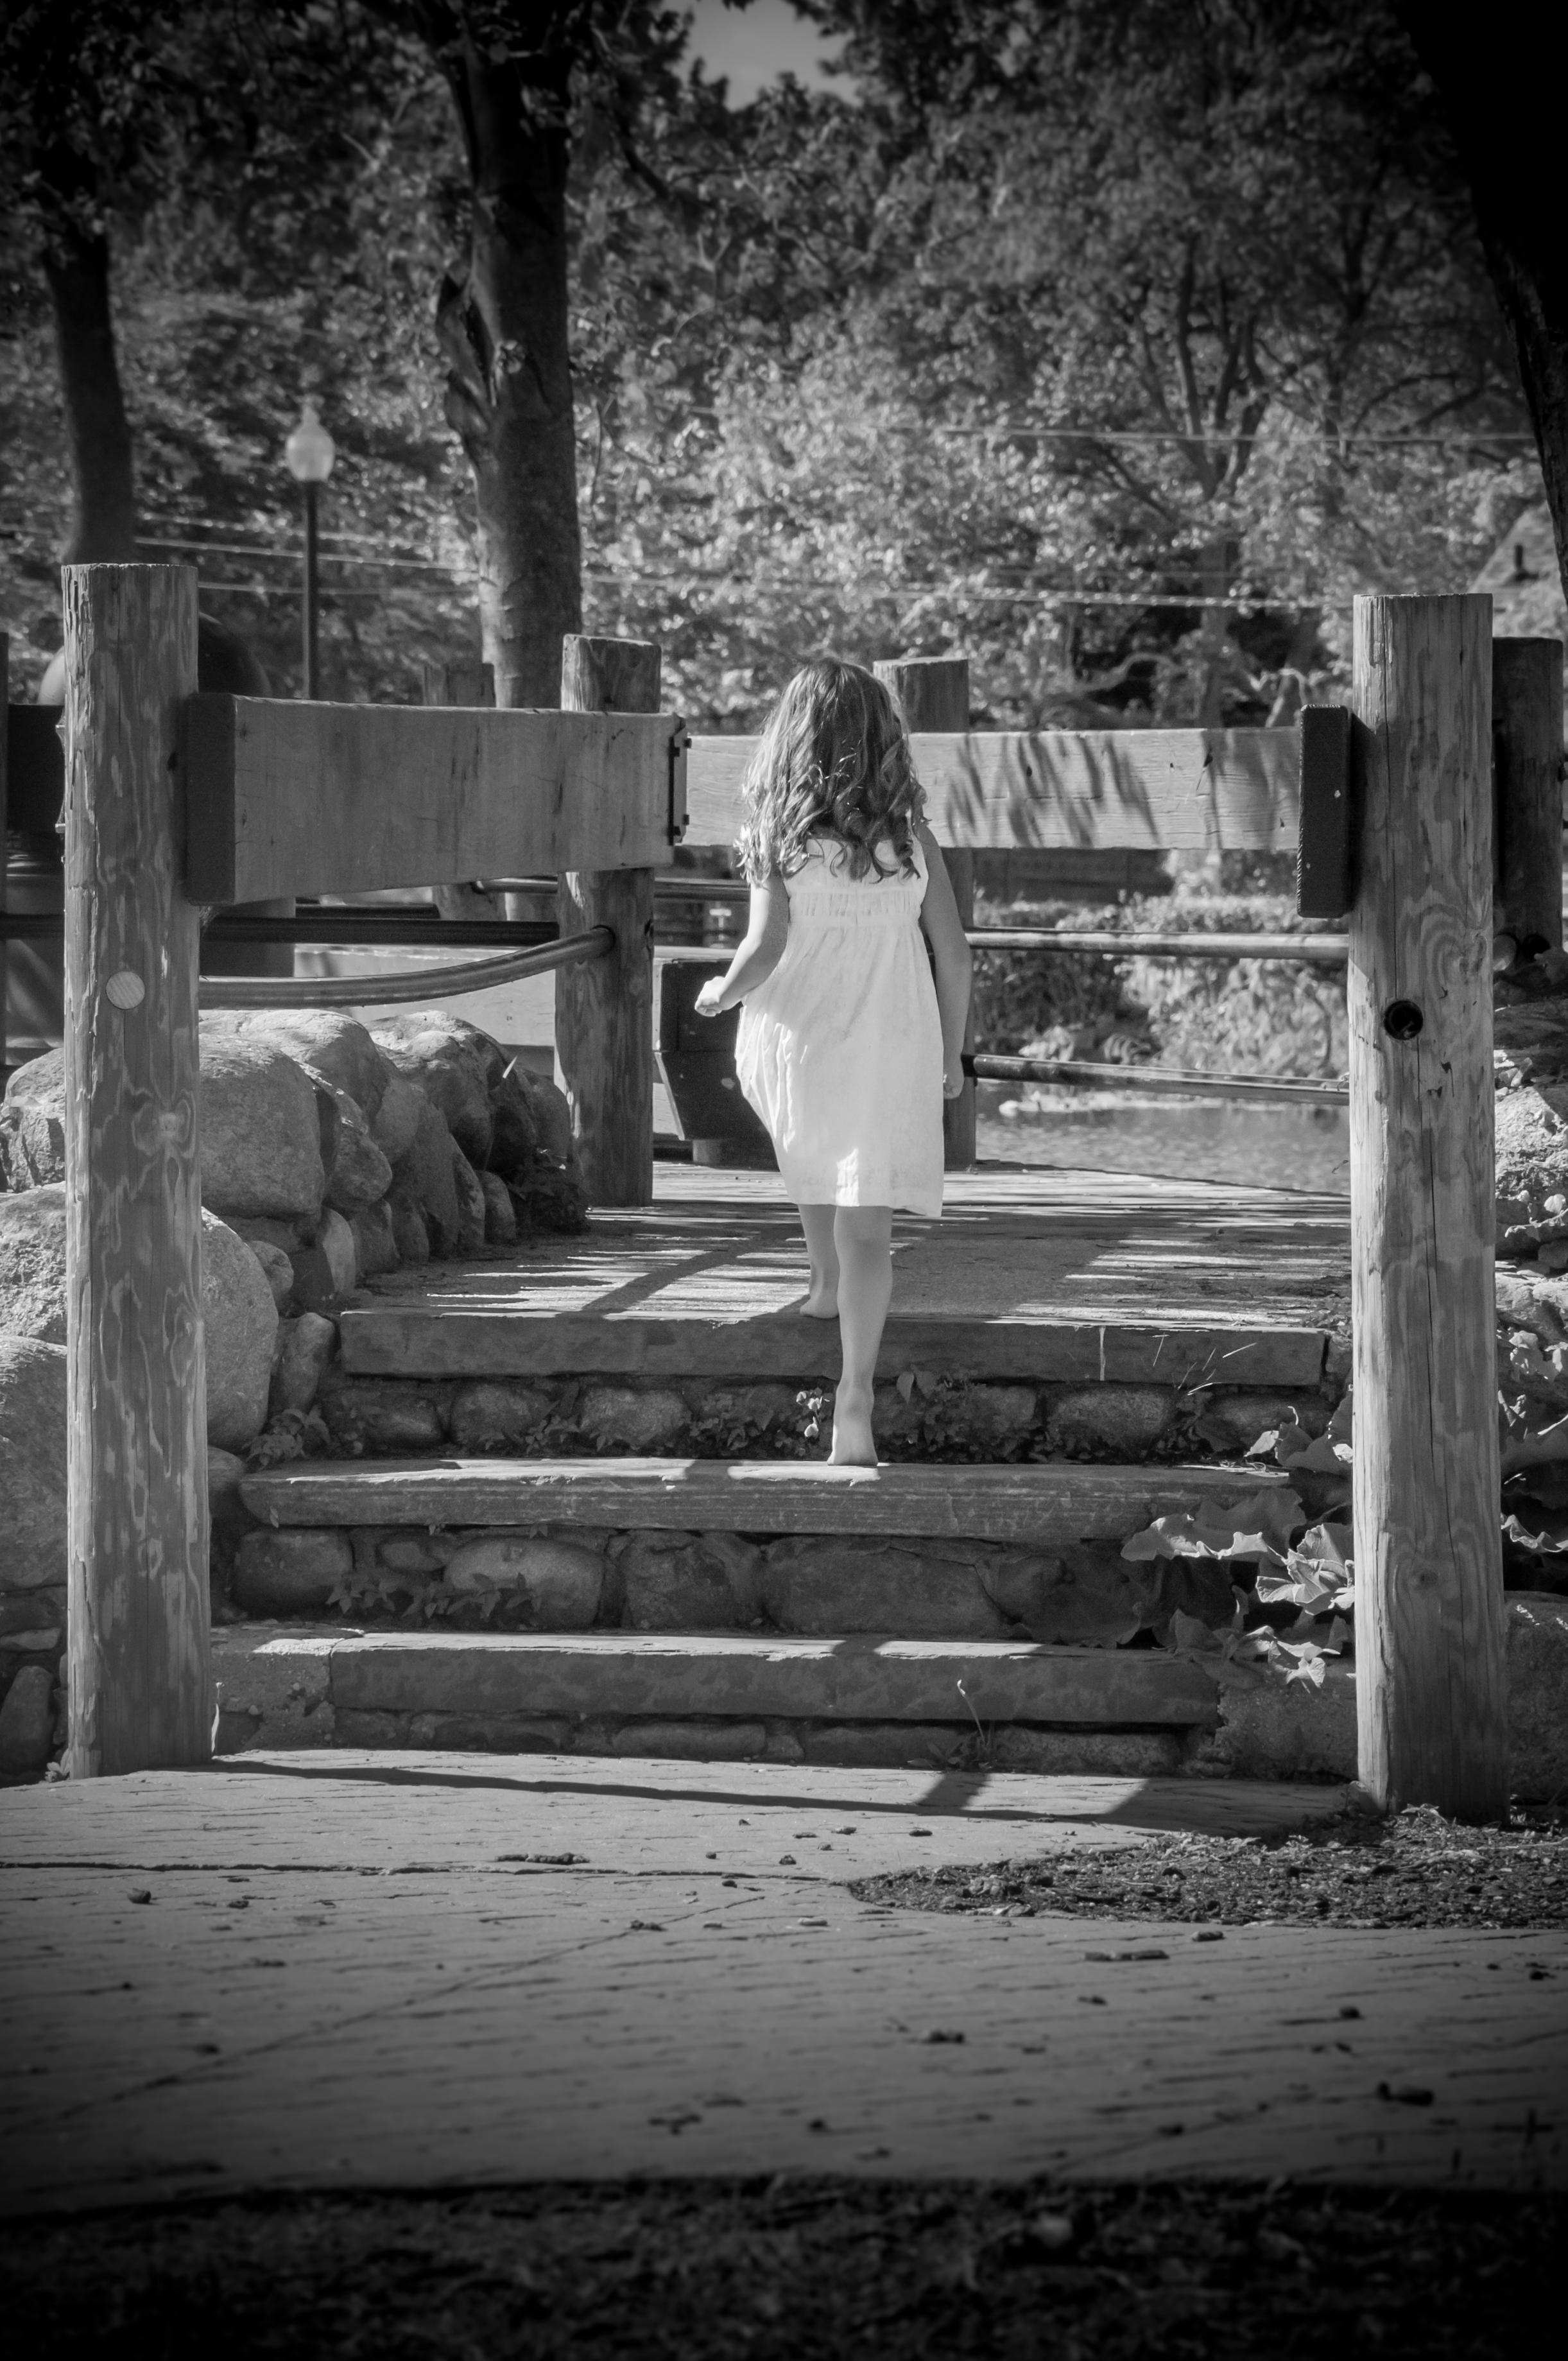 CarrieWestonStudios_Northport_Family_Maternity_Wedding_Portraits_NY_Photography_Photographer-8608.jpg